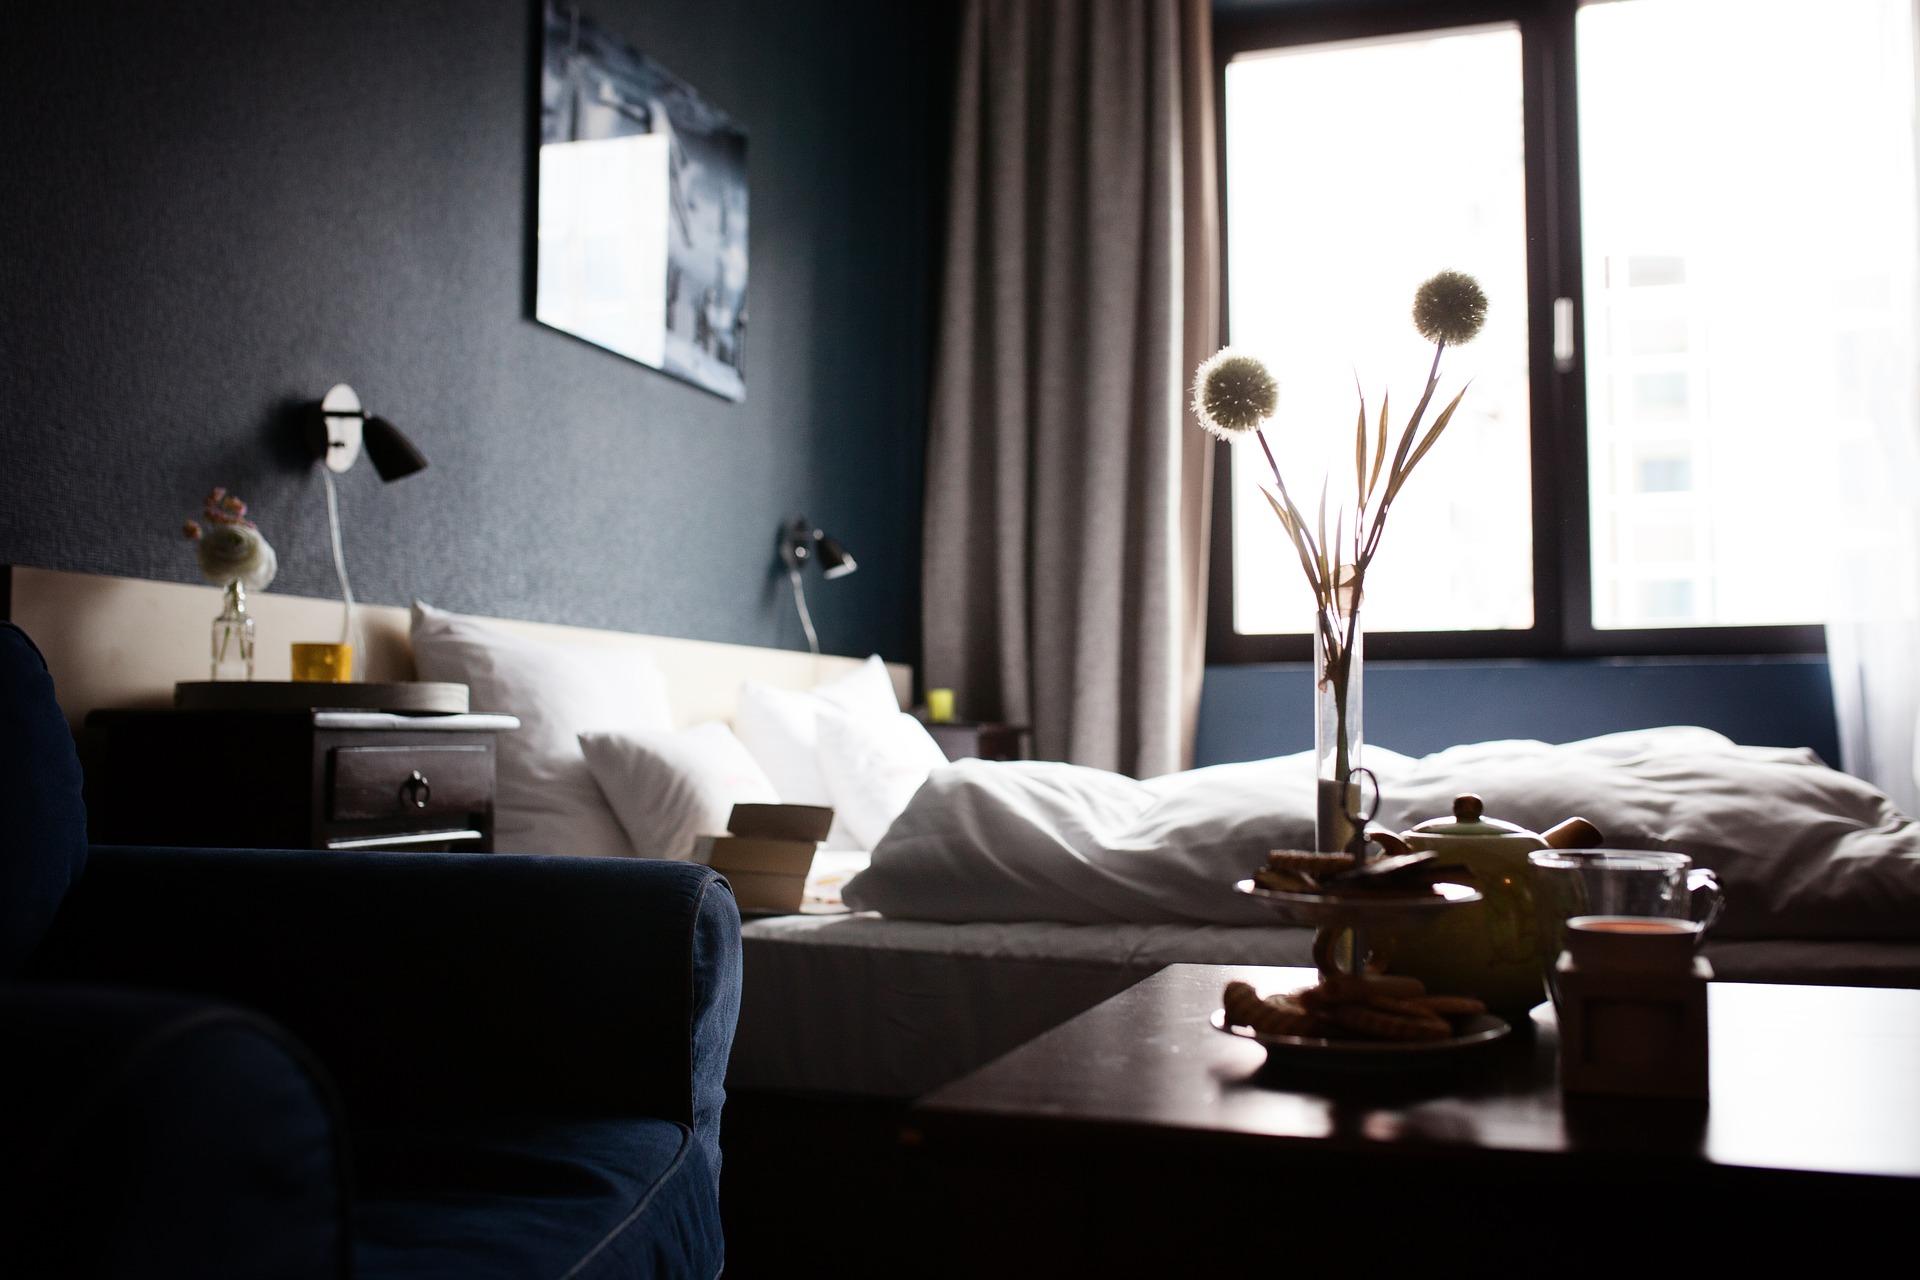 hotel-1749602_1920